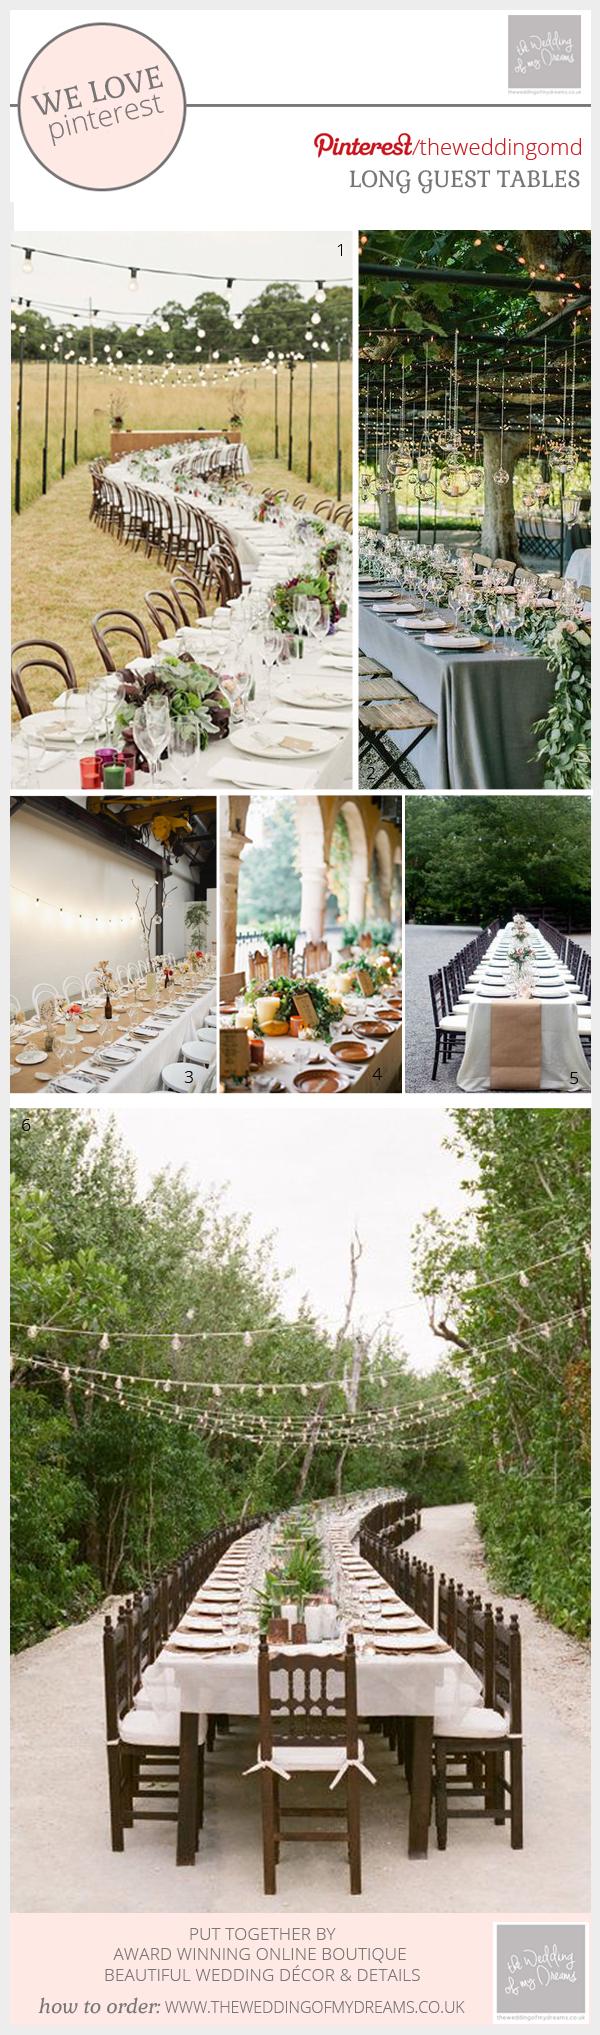 Long wedding guest tables ideas